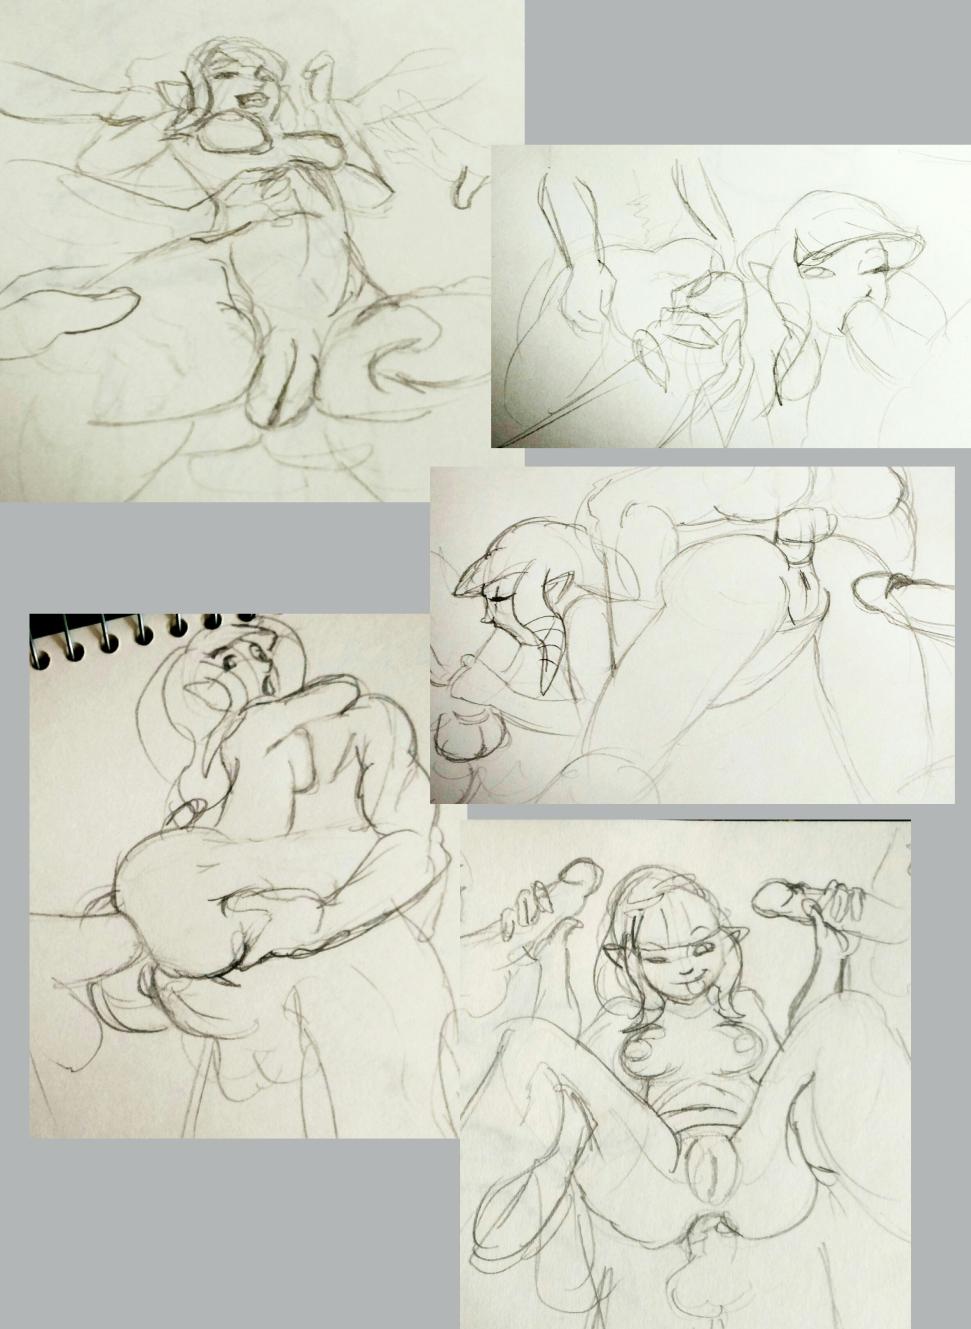 Zelda gangbang sketch dump